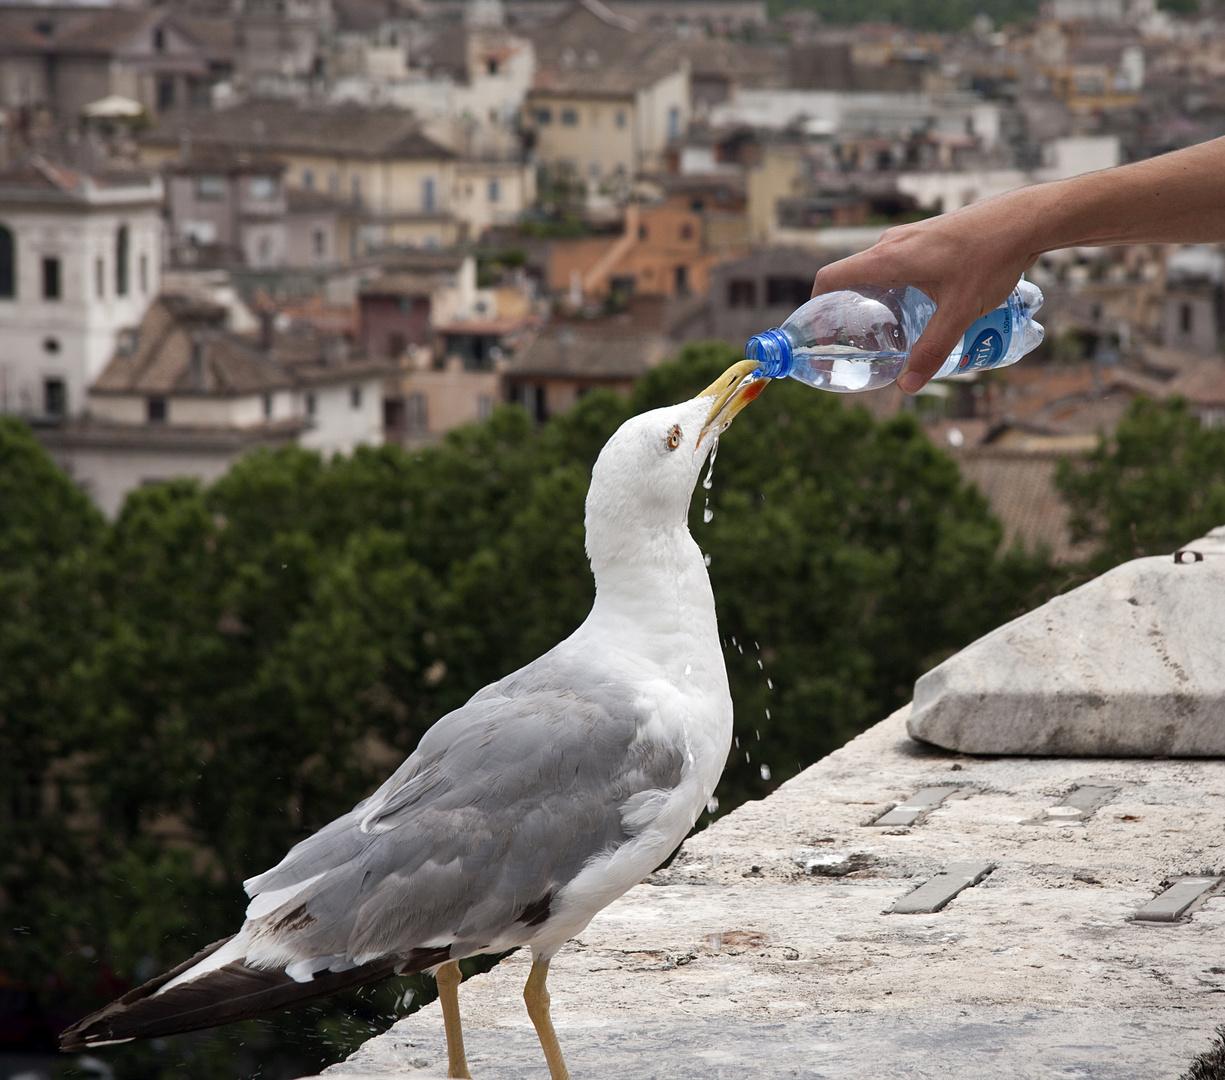 Dar da bere agli assetati (dar de beber al sediento)